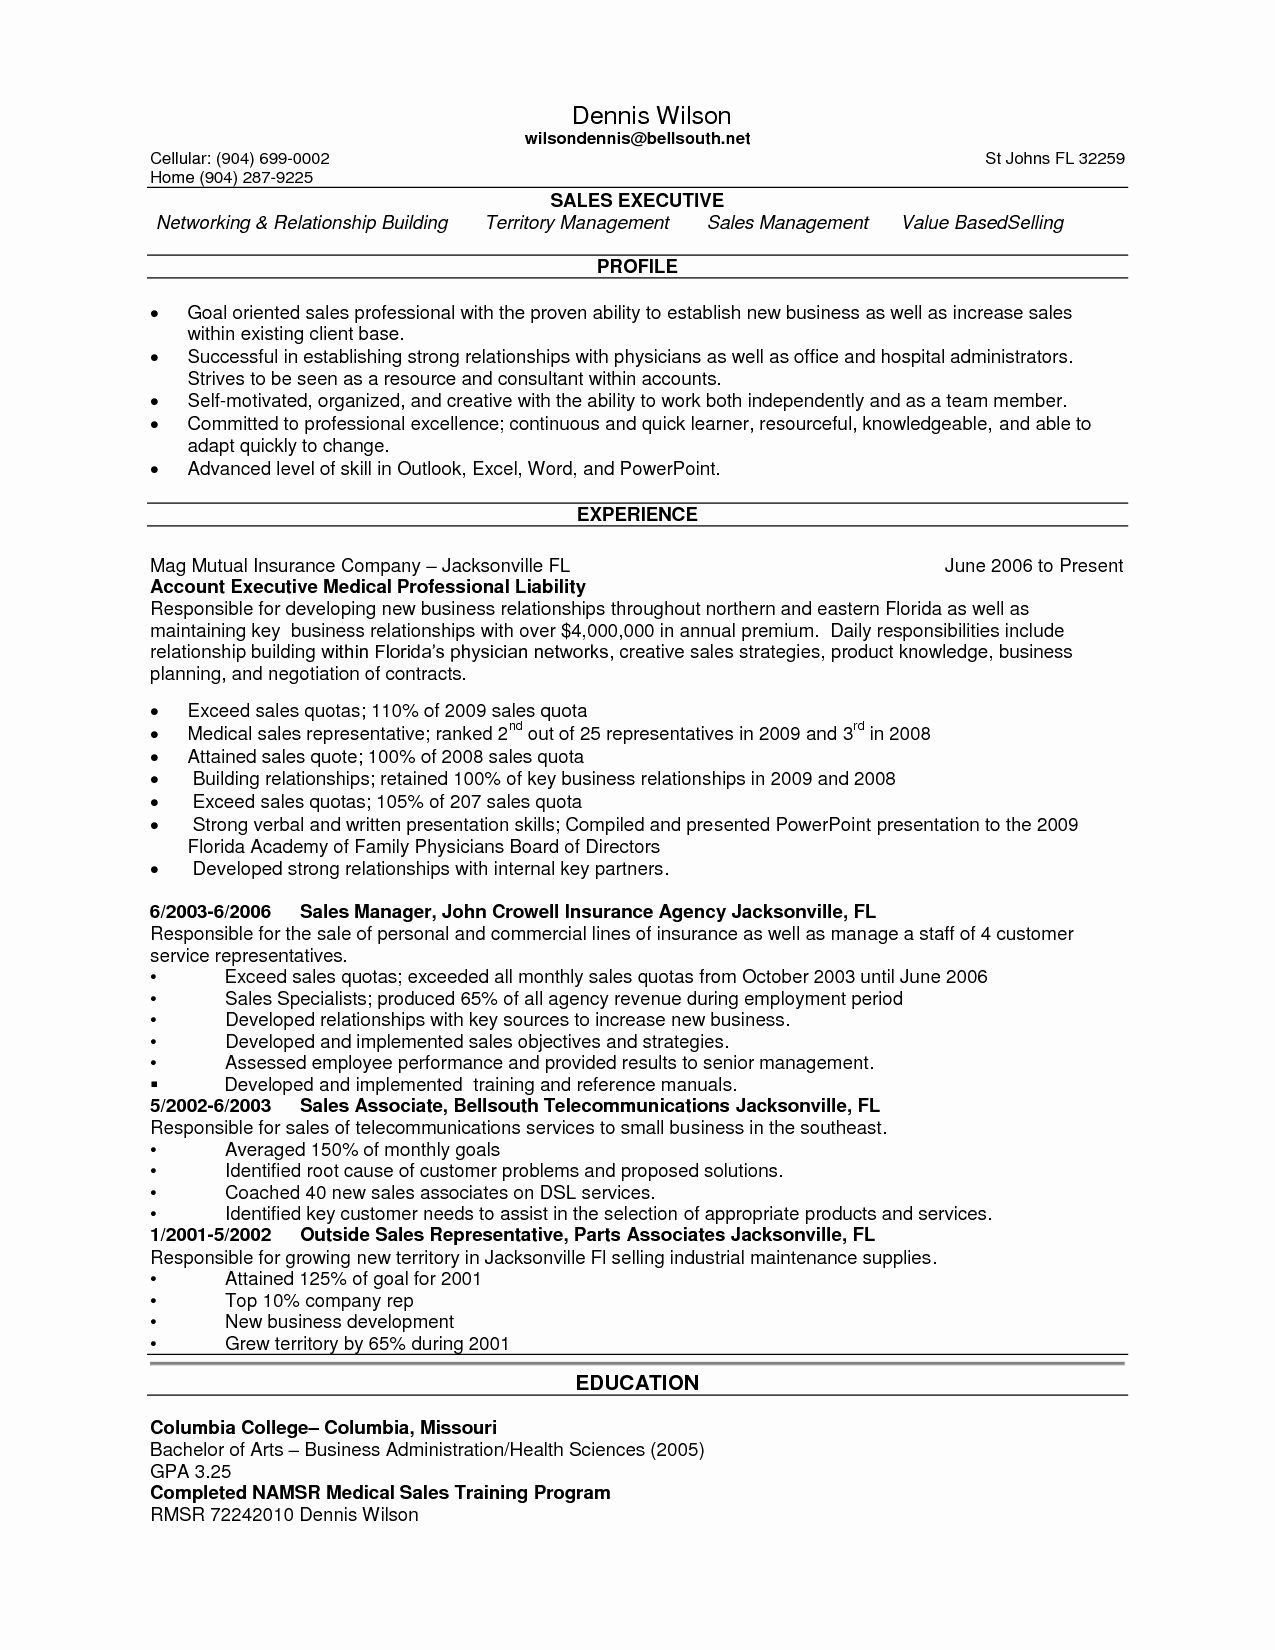 Sales Rep Resume Summary